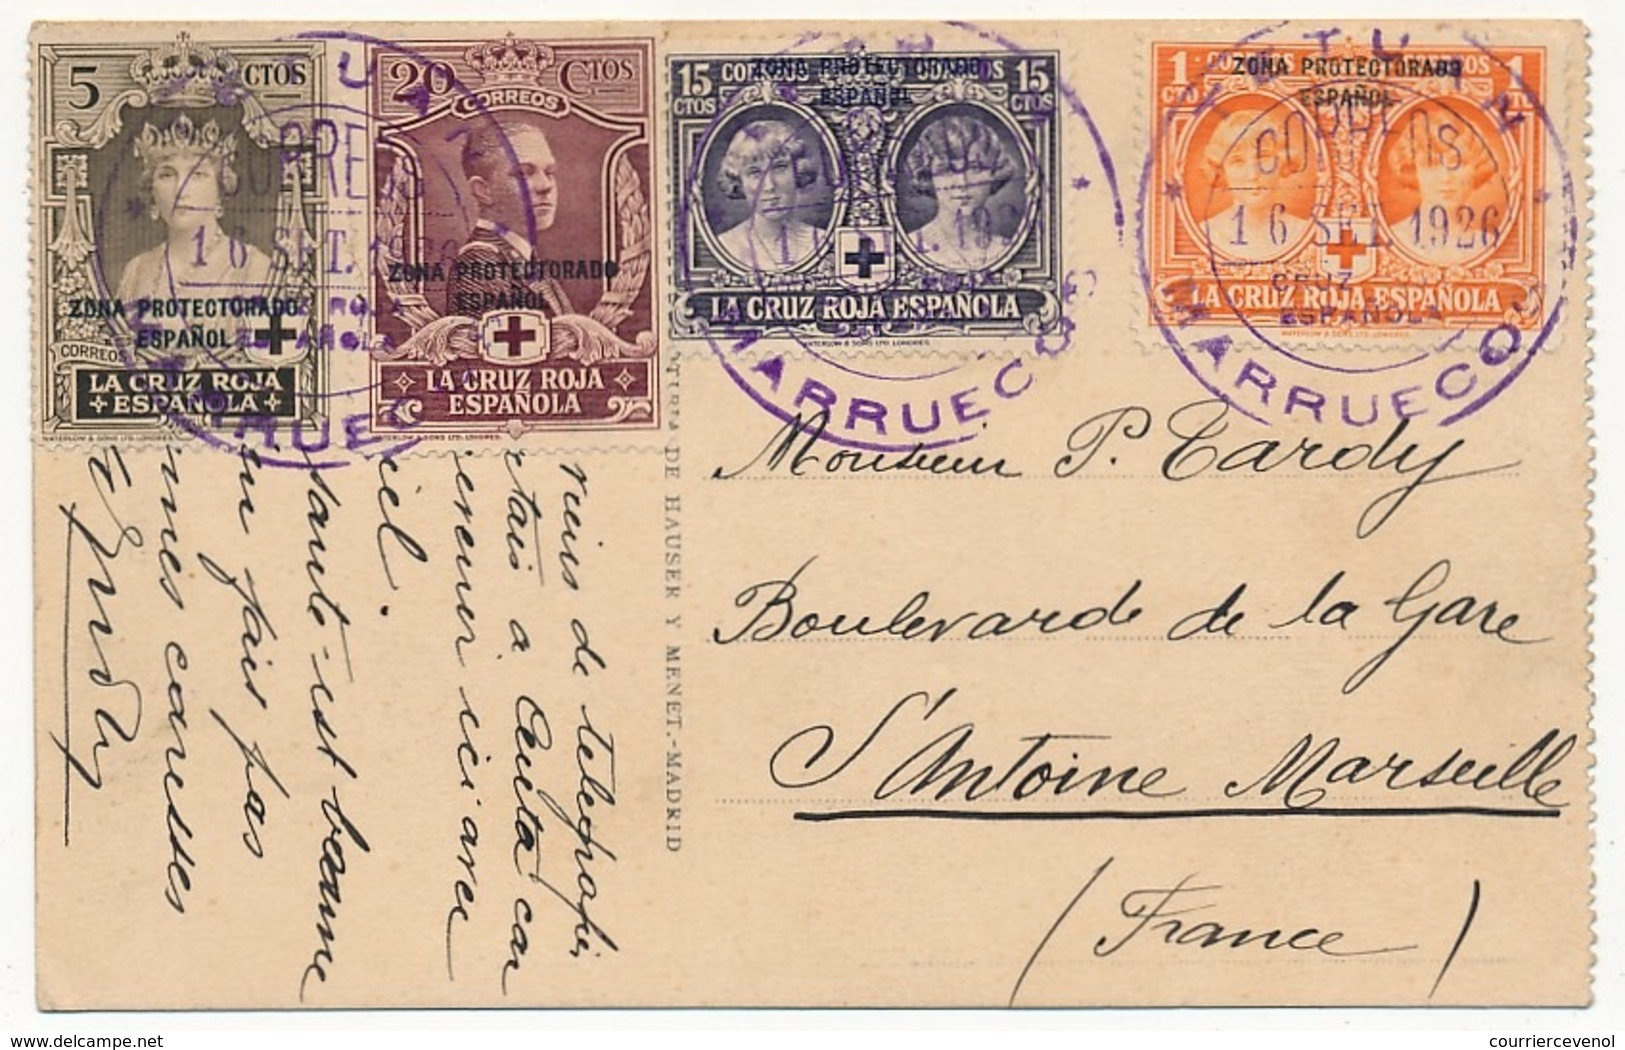 "MAROC ESPAGNOL - Carte Postale Affr. Composé TP Surchargés ""Zona Protectorado Espanol"" TETUAN 1926 - Maroc Espagnol"